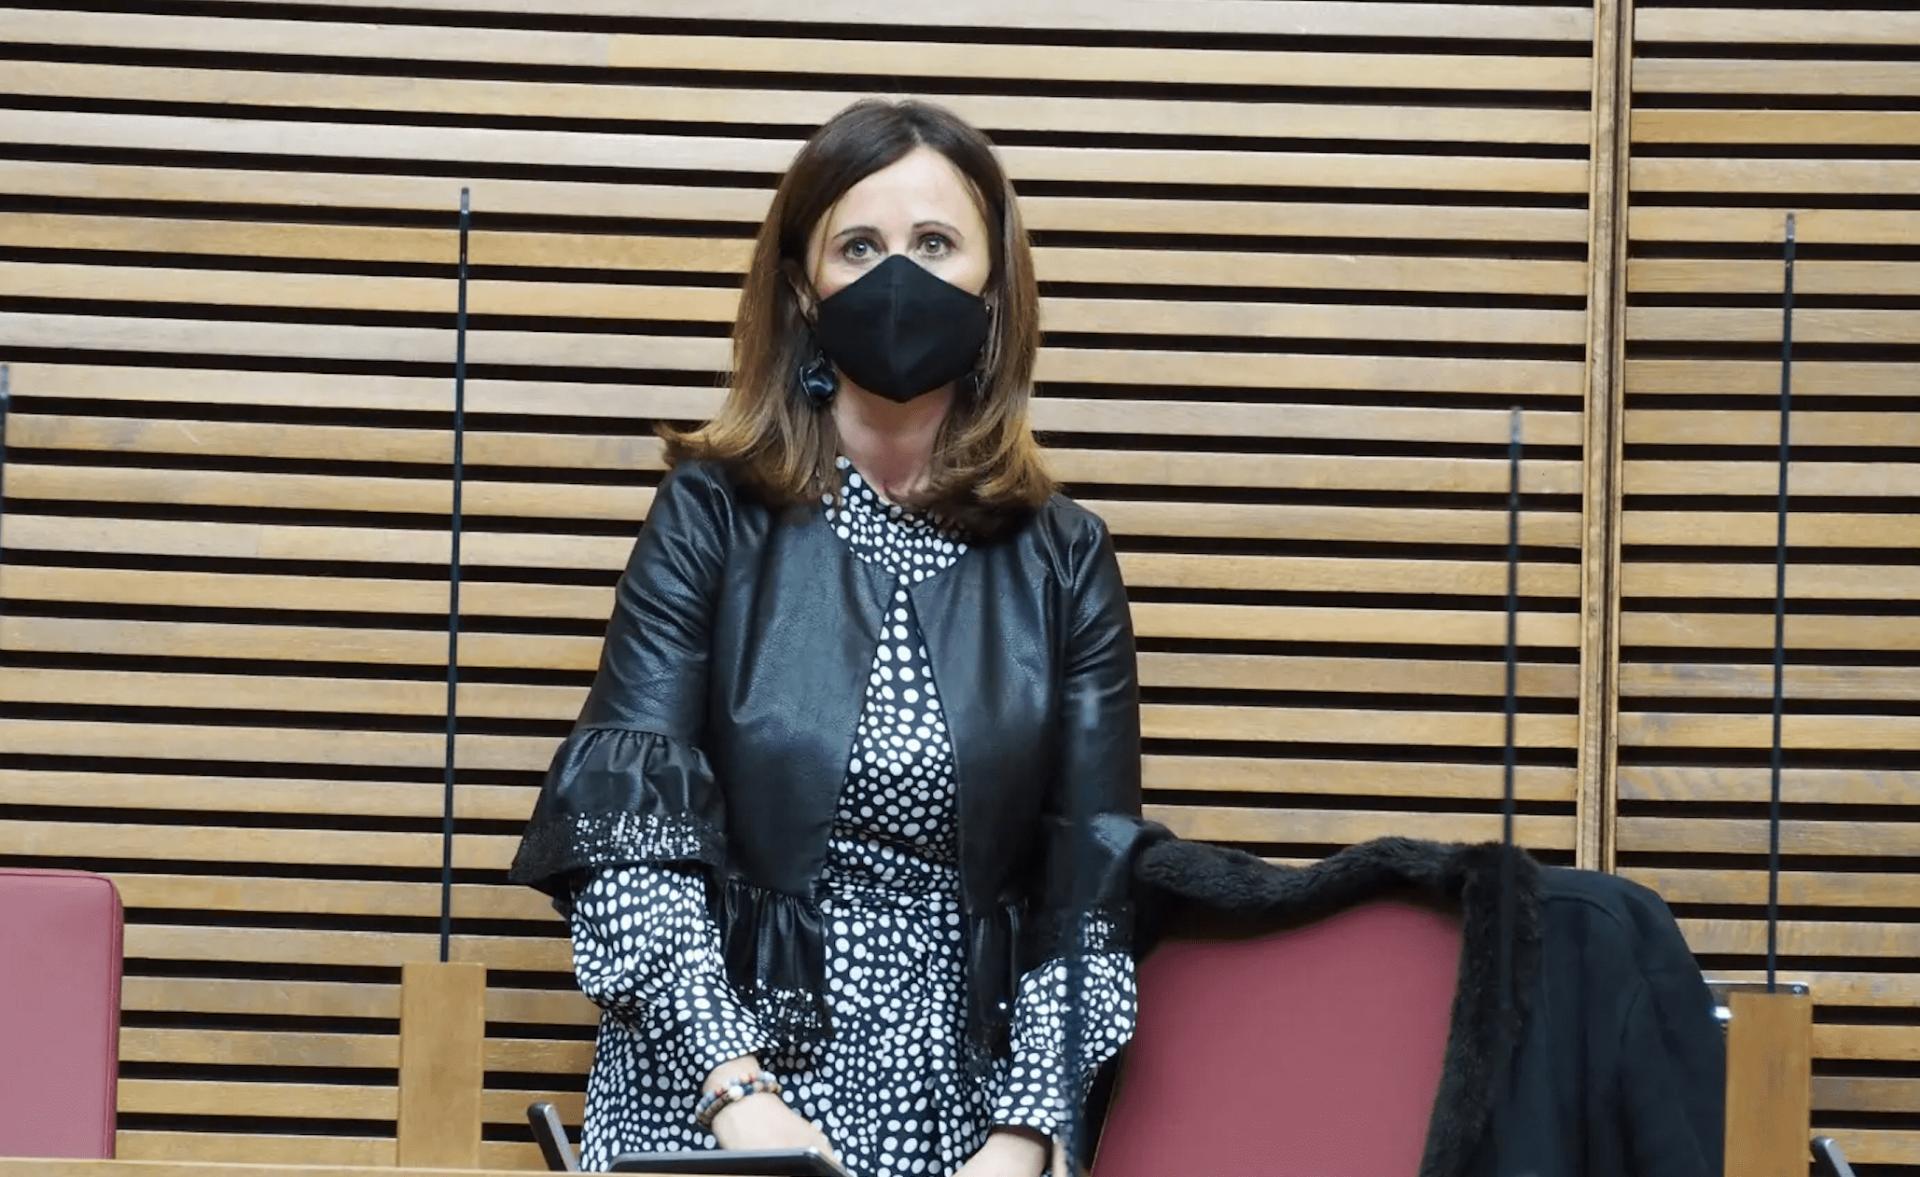 La portavoz de Juventud del PSPV-PSOE en Les Corts Valencianes, Aroa Mira,